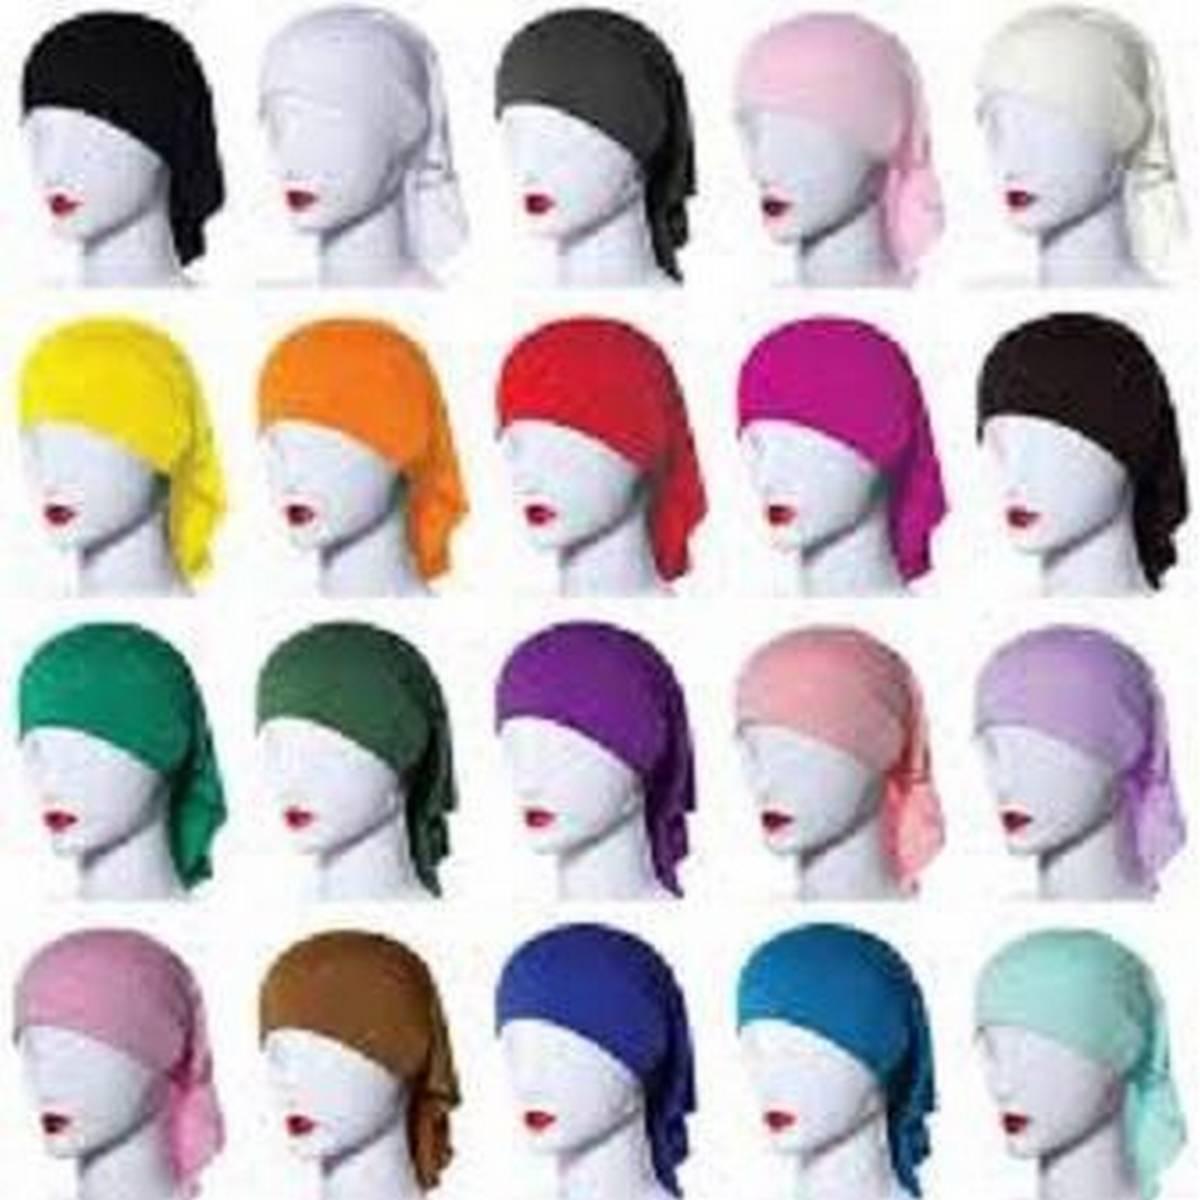 Pack of 9 Plain Muslim Headscarf Inner Hijab Caps Wraps Women Islamic Under Scarf Ninja Scarf Stretch Cotton Bonnet Caps